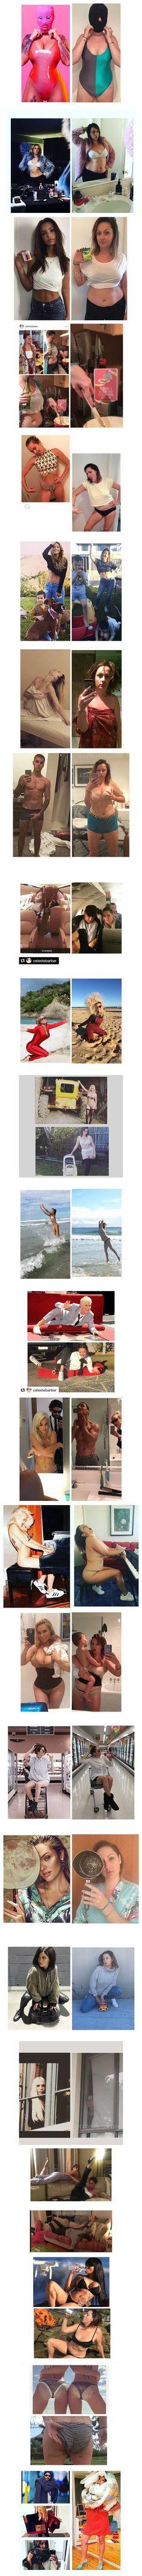 Wooman Selesta Barber reenacts celebrities photo — ANONS BEST FILMS